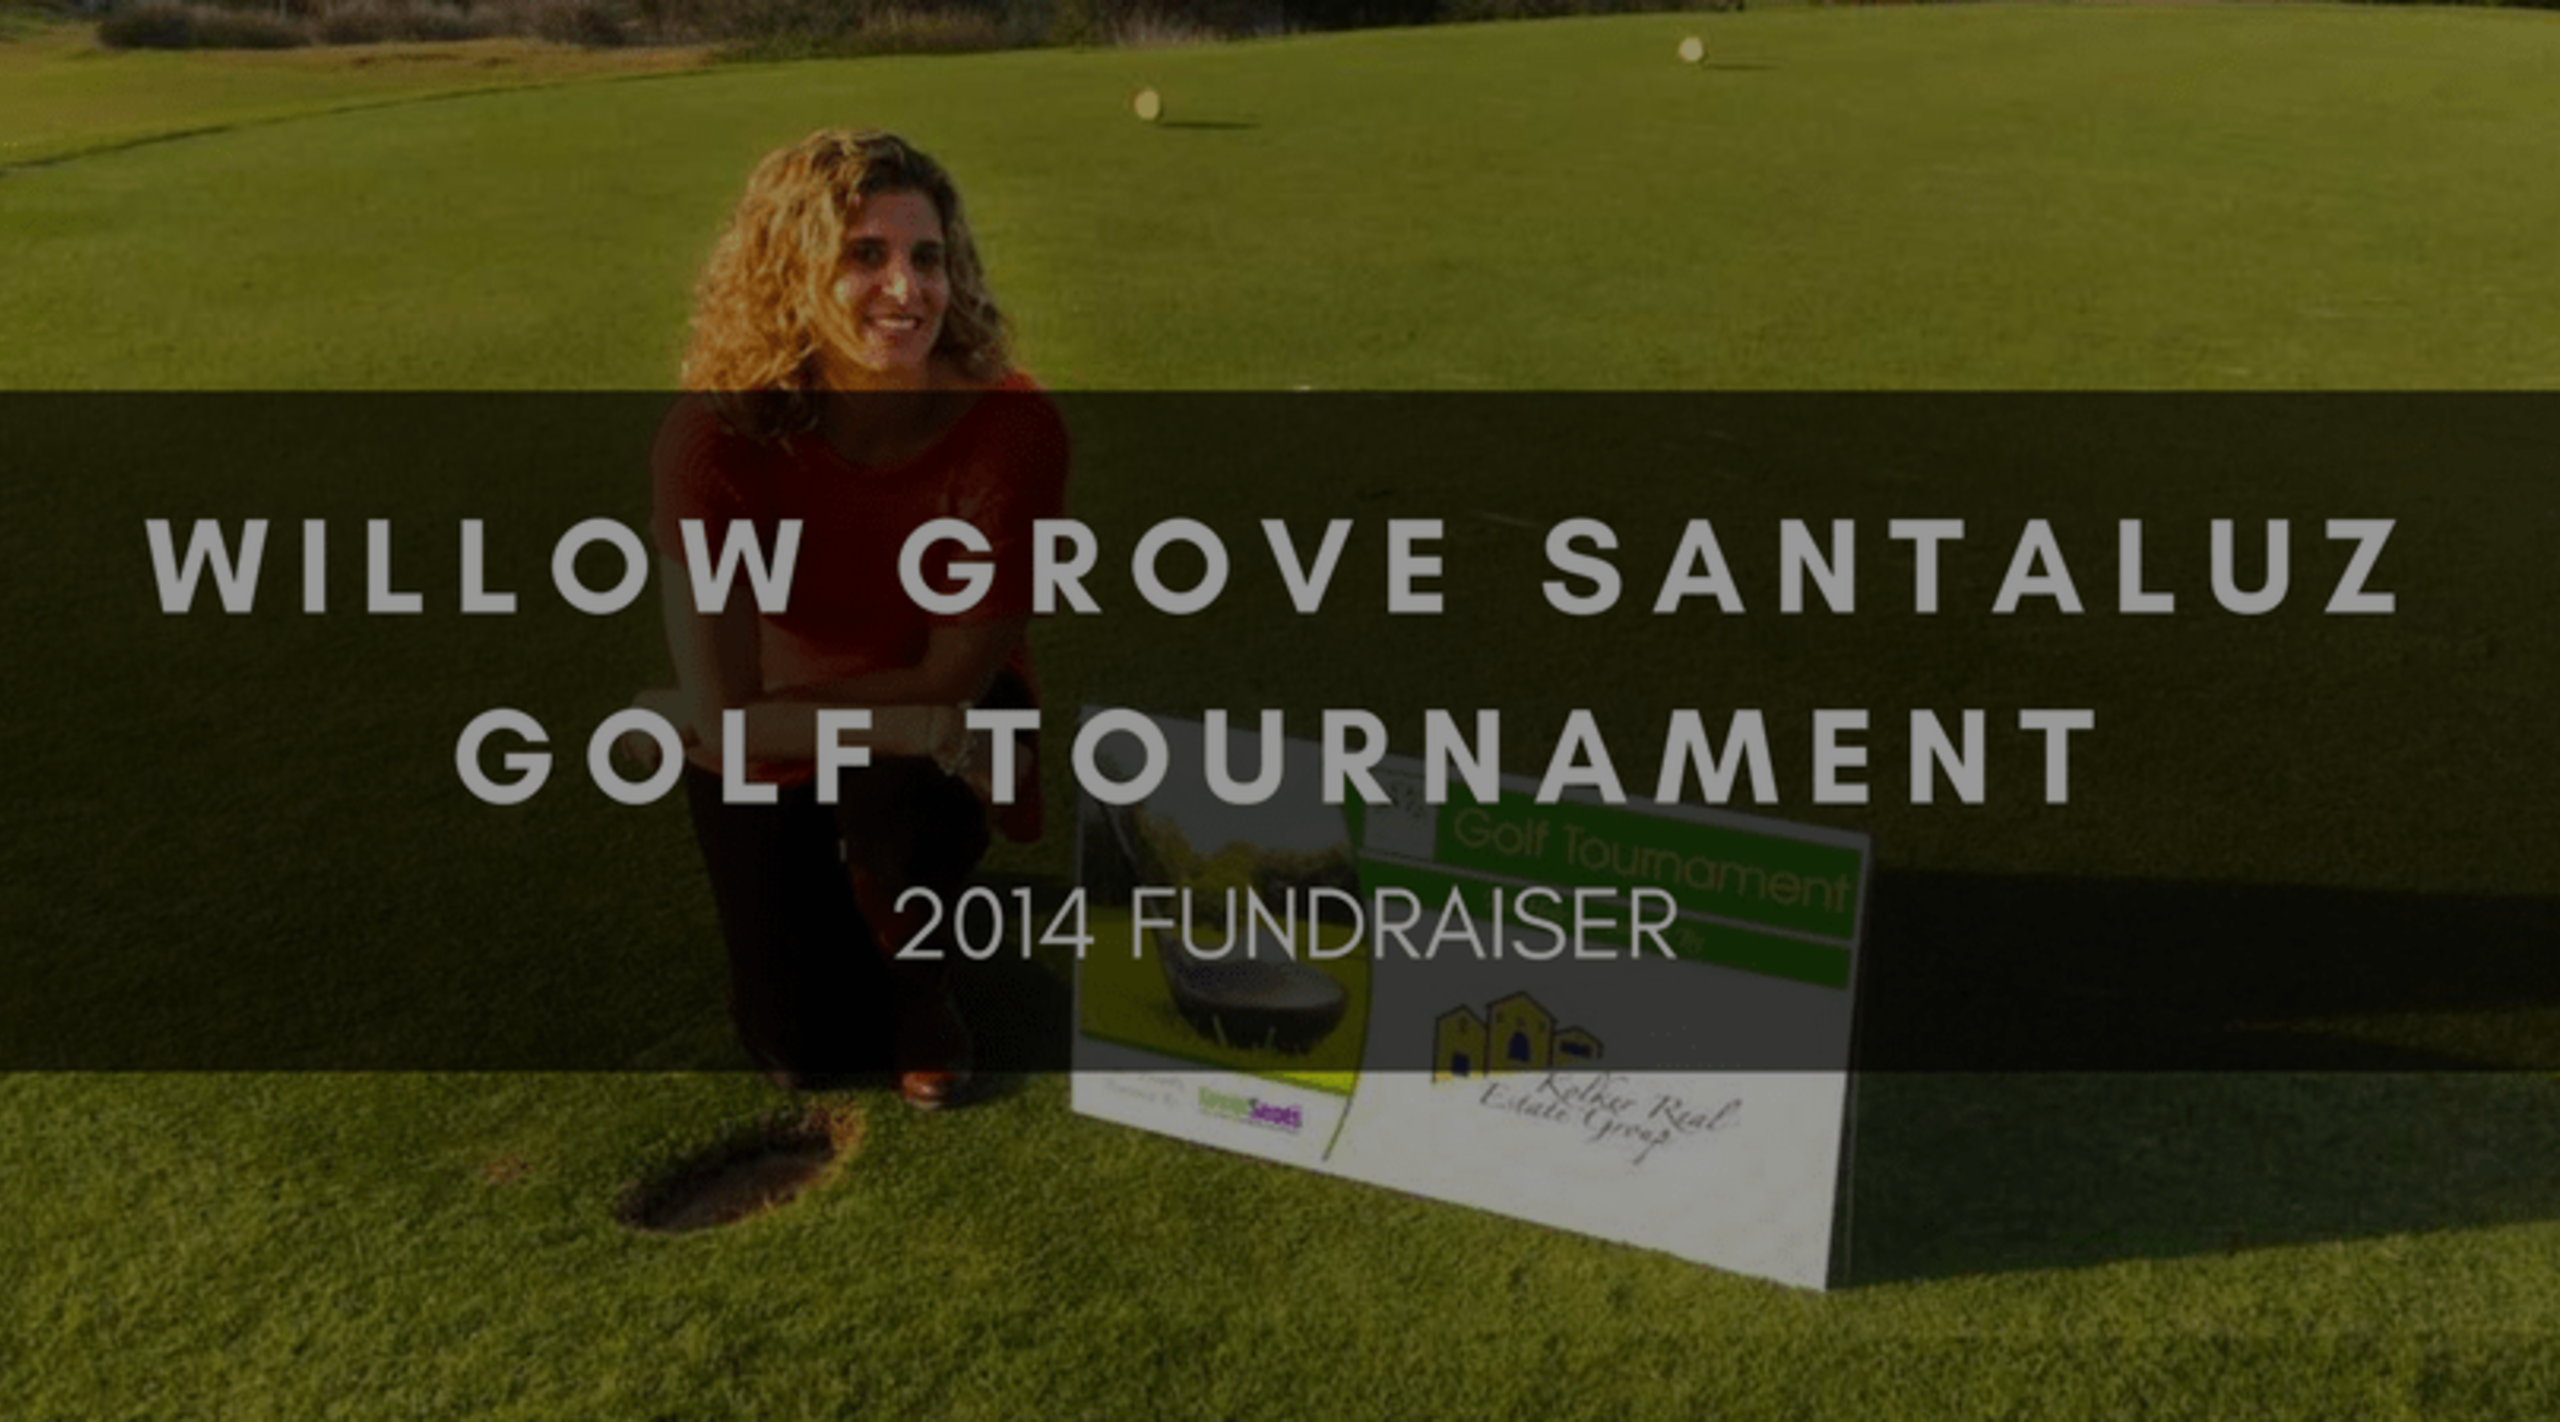 WILLOW GROVE SANTALUZ GOLF TOURNAMENT 2014 FUNDRAISER